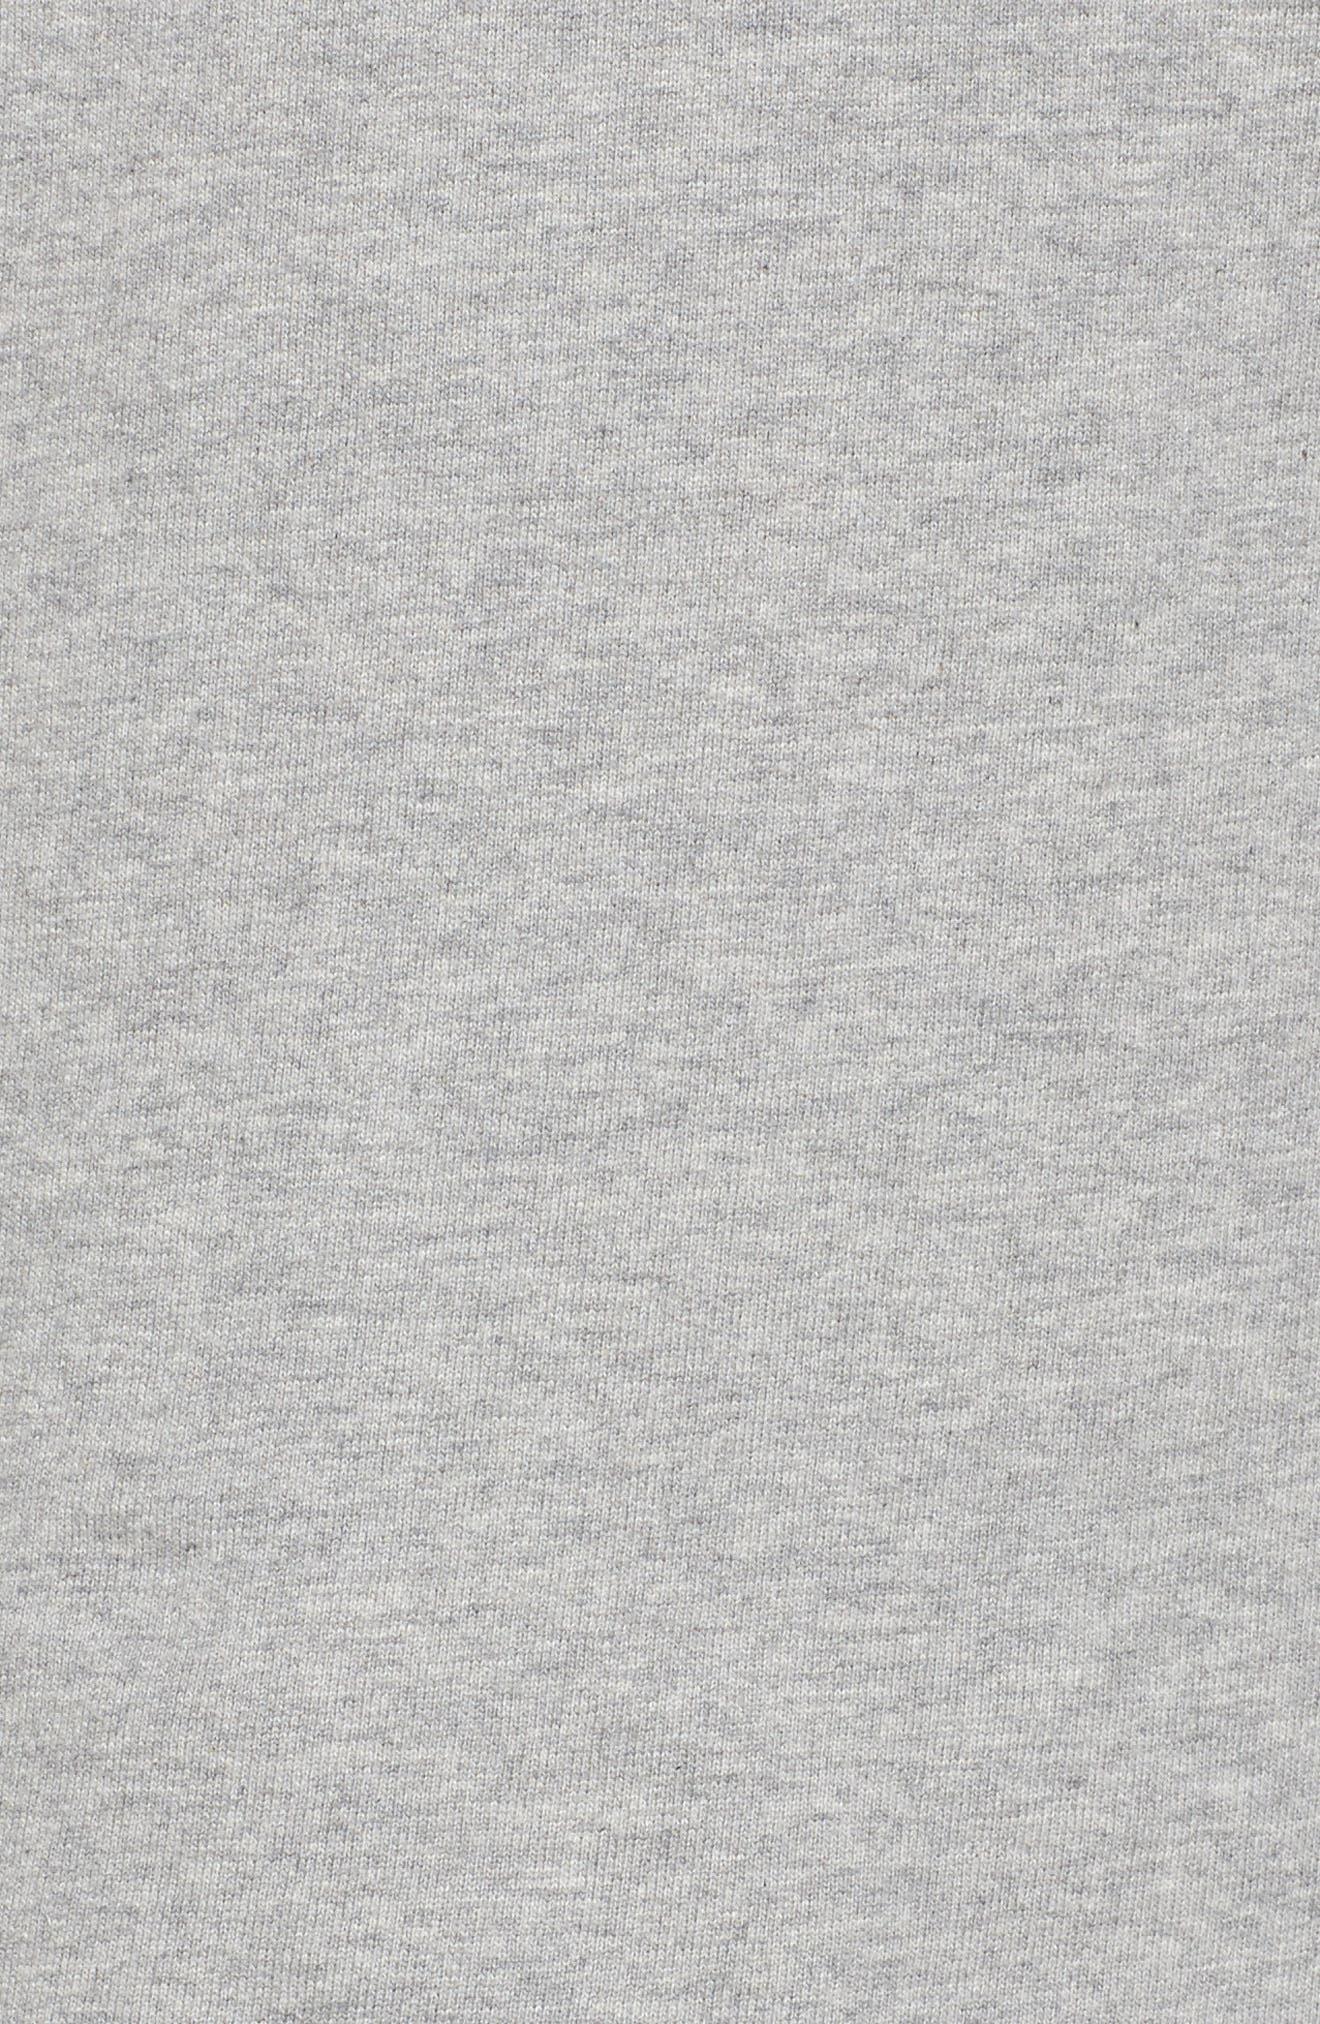 NFL New England Patriots Champion Sweatshirt,                             Alternate thumbnail 6, color,                             Heather Grey